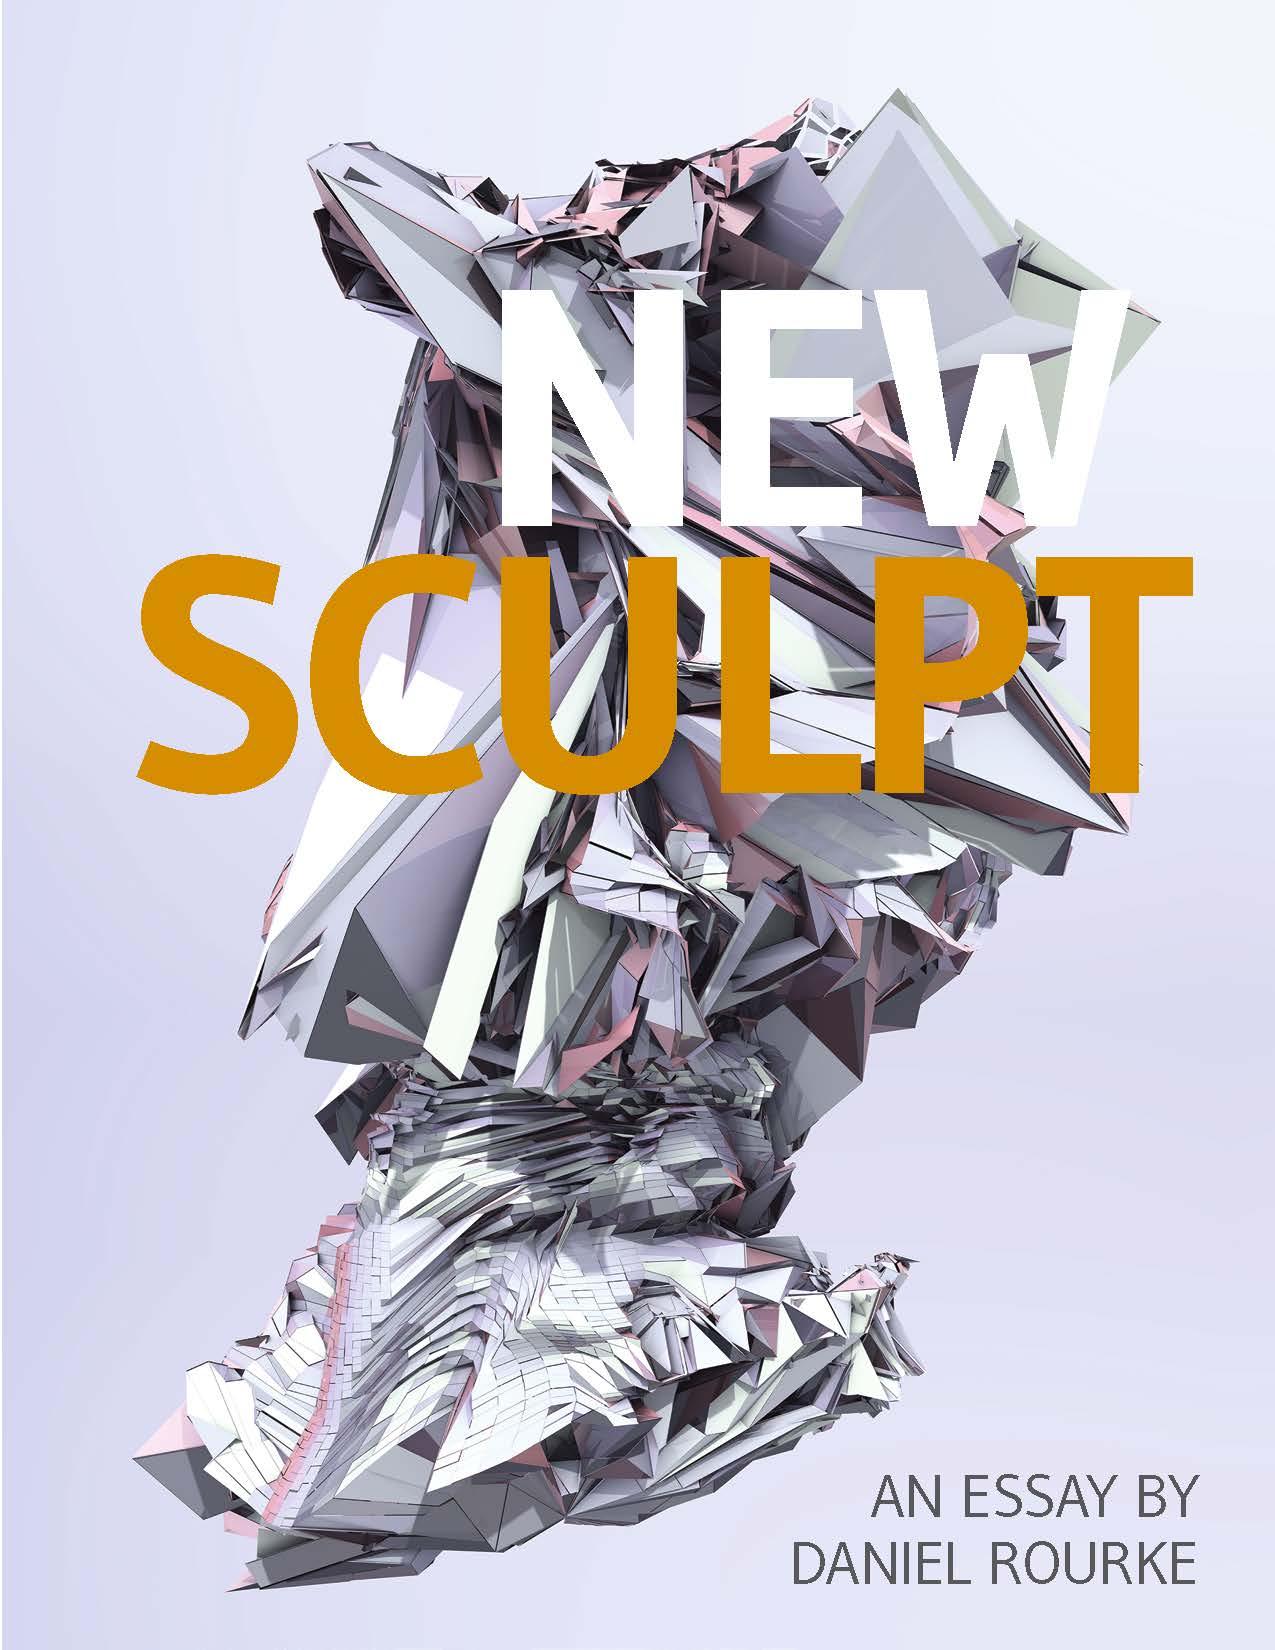 New Sculpt, LaTurbo Avedon (essay by Daniel Rourke)